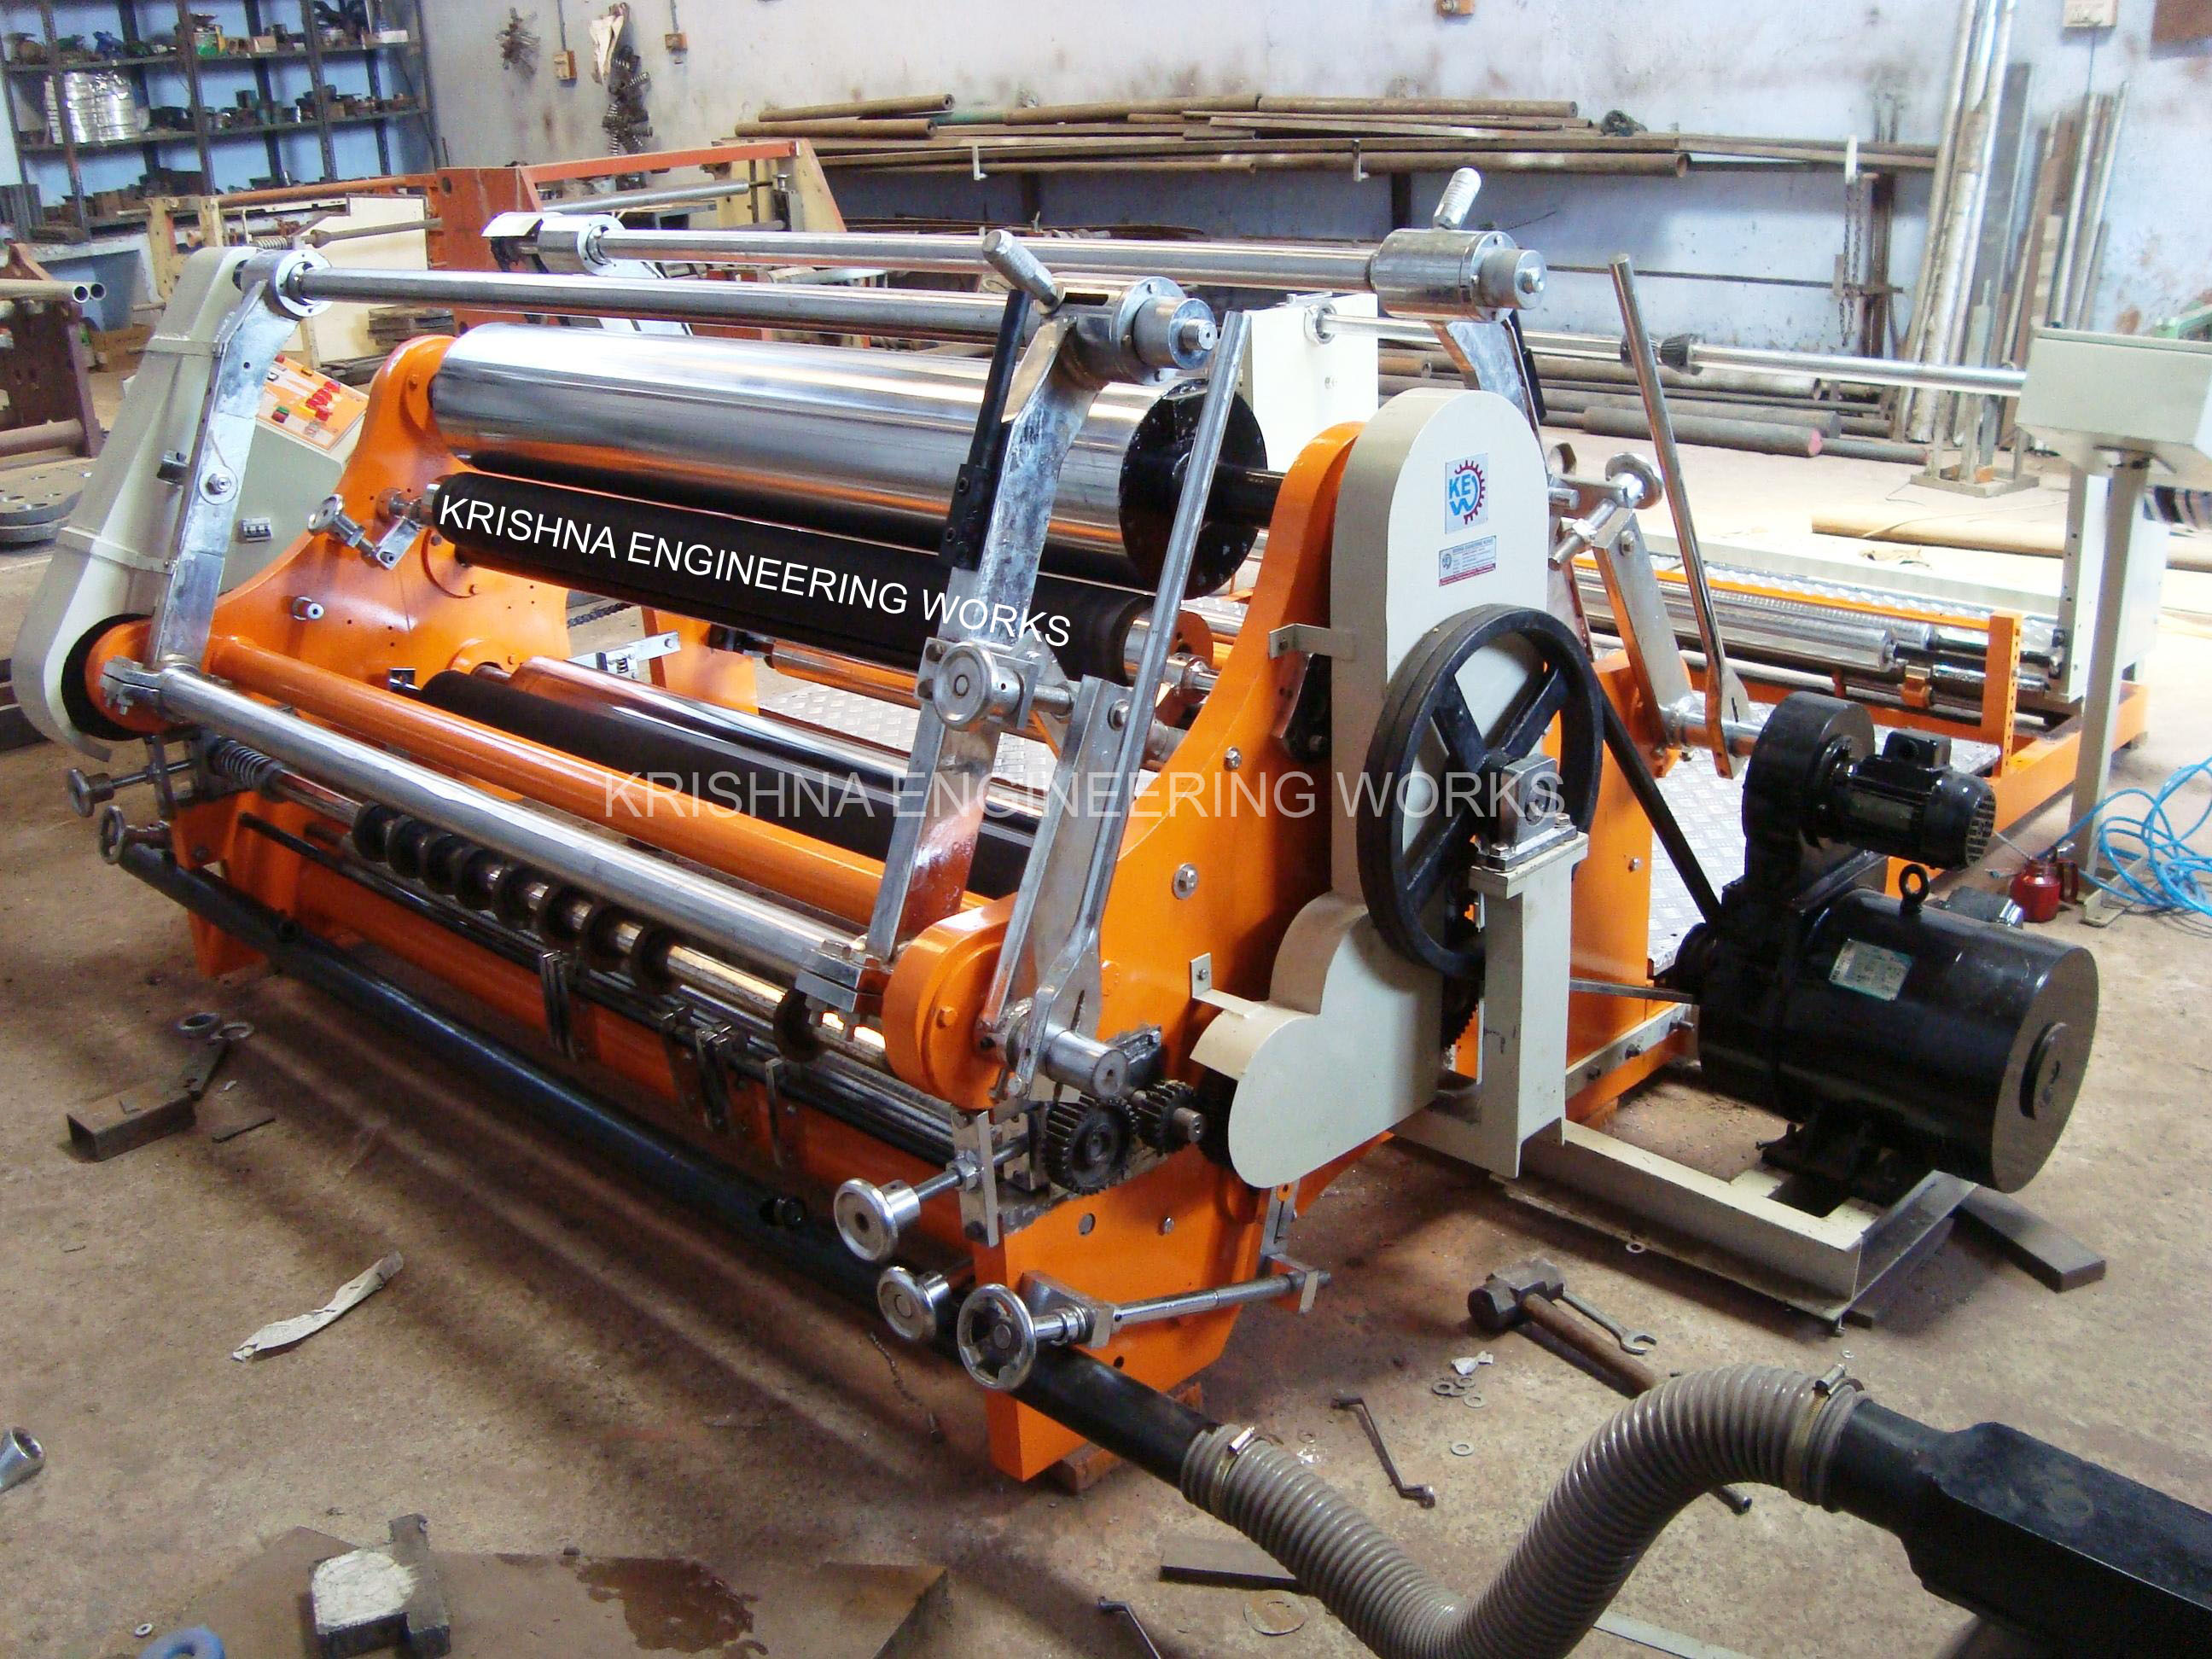 "<a href=""http://www.krishnaengineeringworks.co.za/slitter-rewinder-machine/"">Slitter Rewinder Machine</a>"